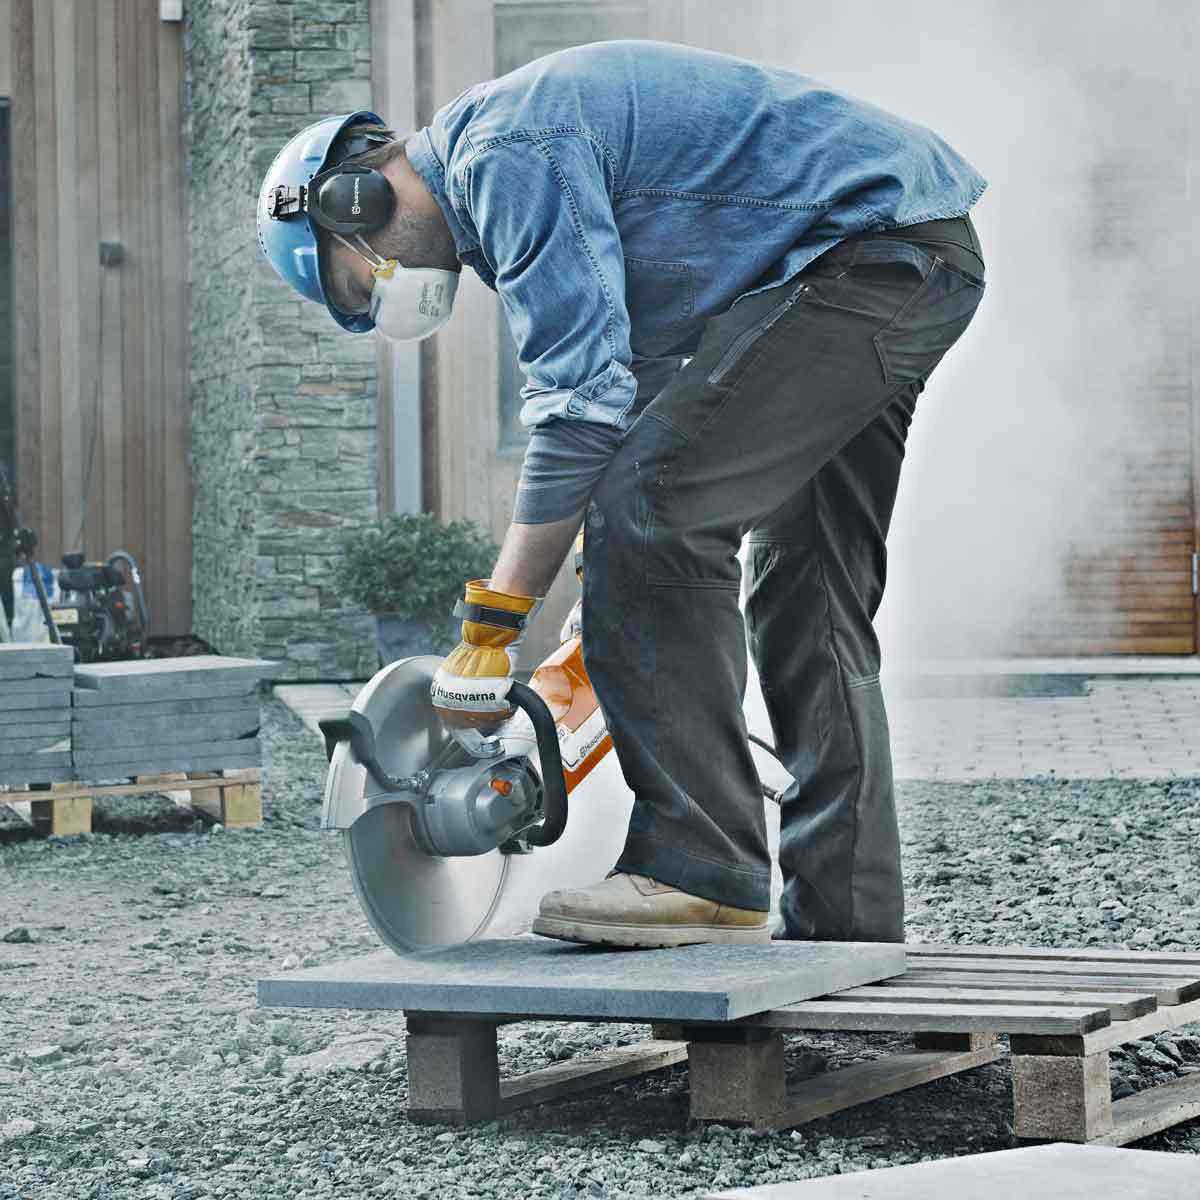 Husqvarna K3000 dry stone cutting